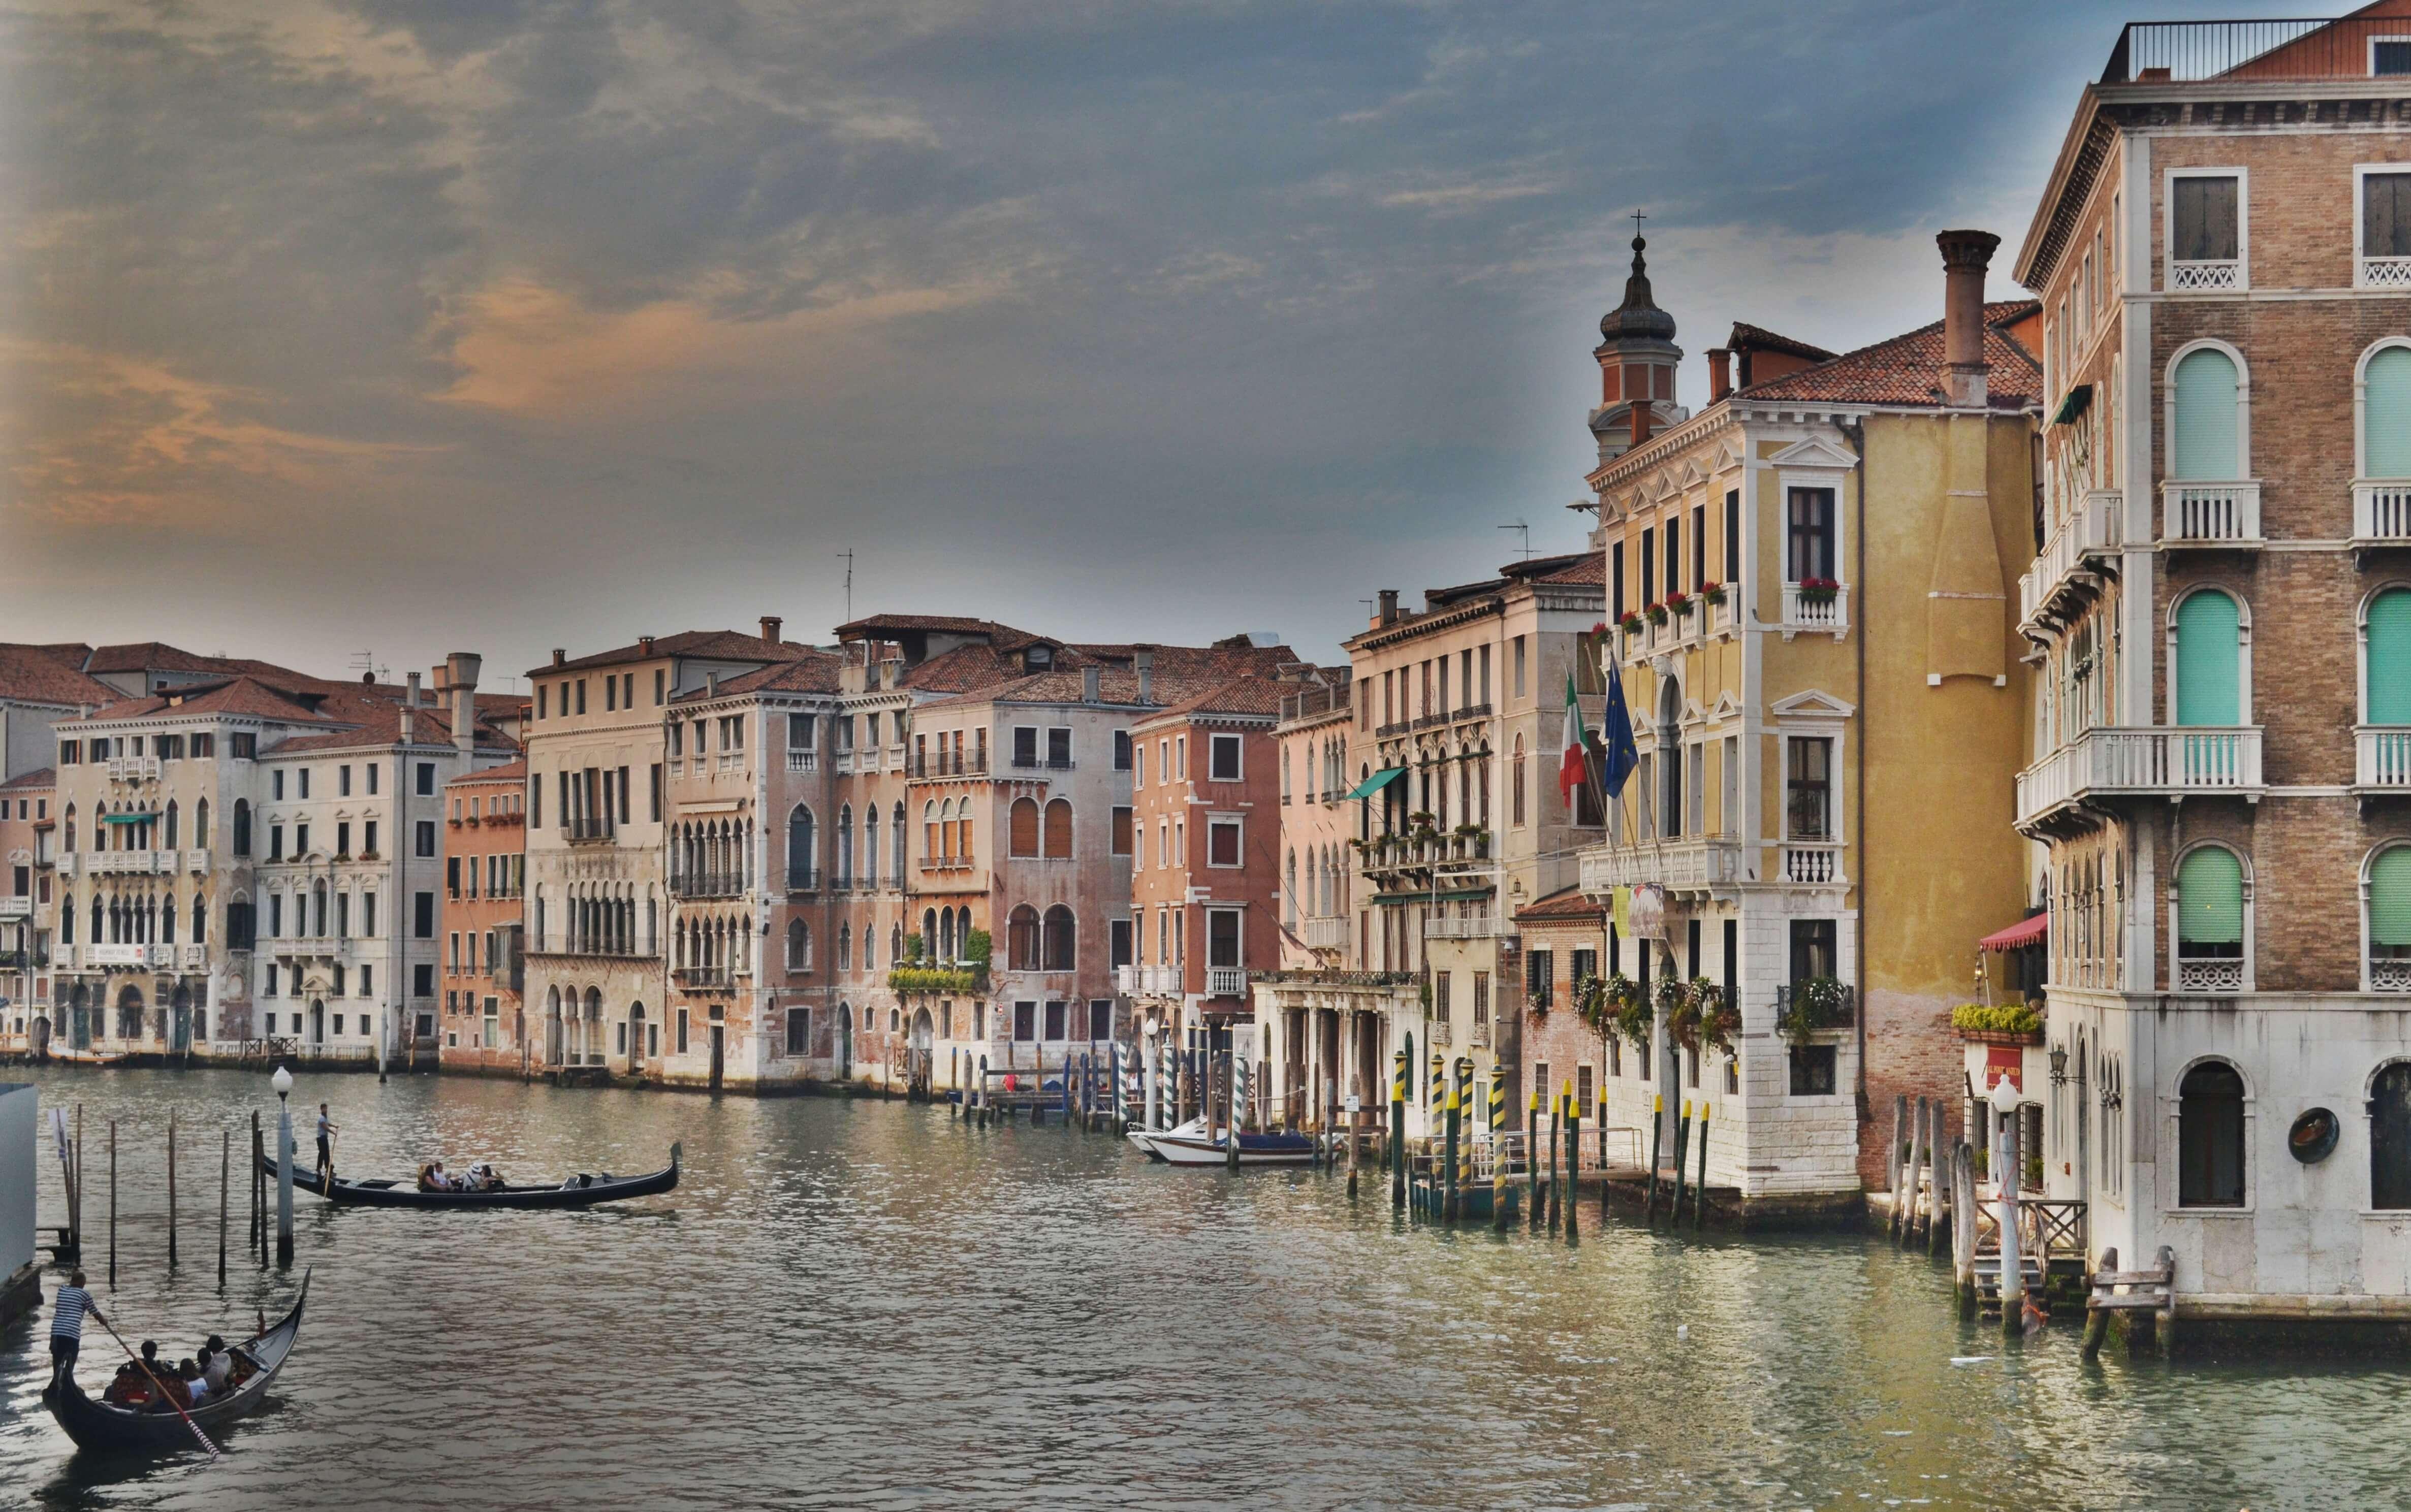 Canale Grande, Vendig, Häuser im Wasser